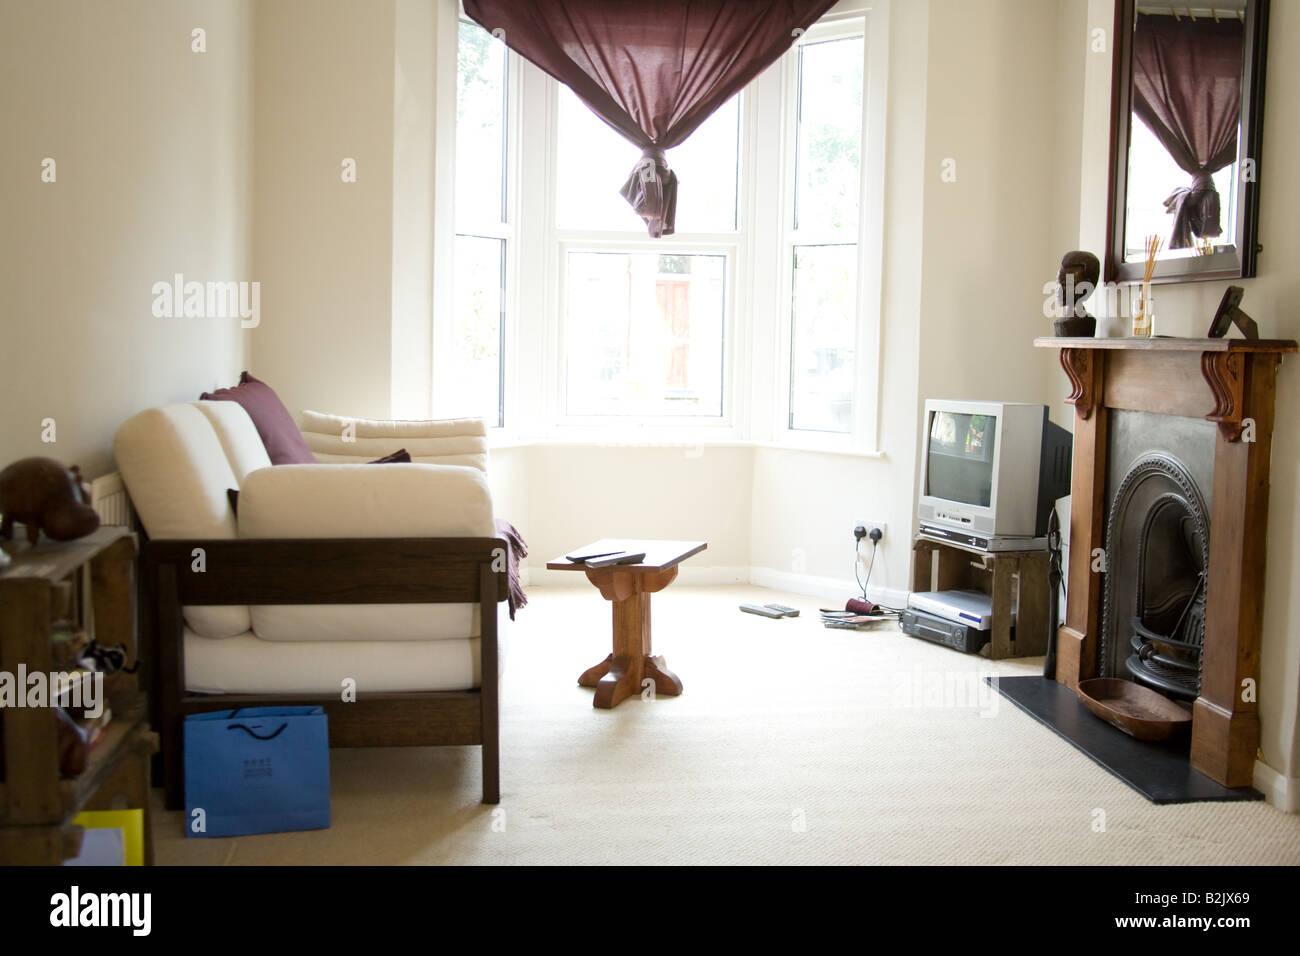 Modern Living Room Of A Victorian Terrace House London England Stock Photo Alamy